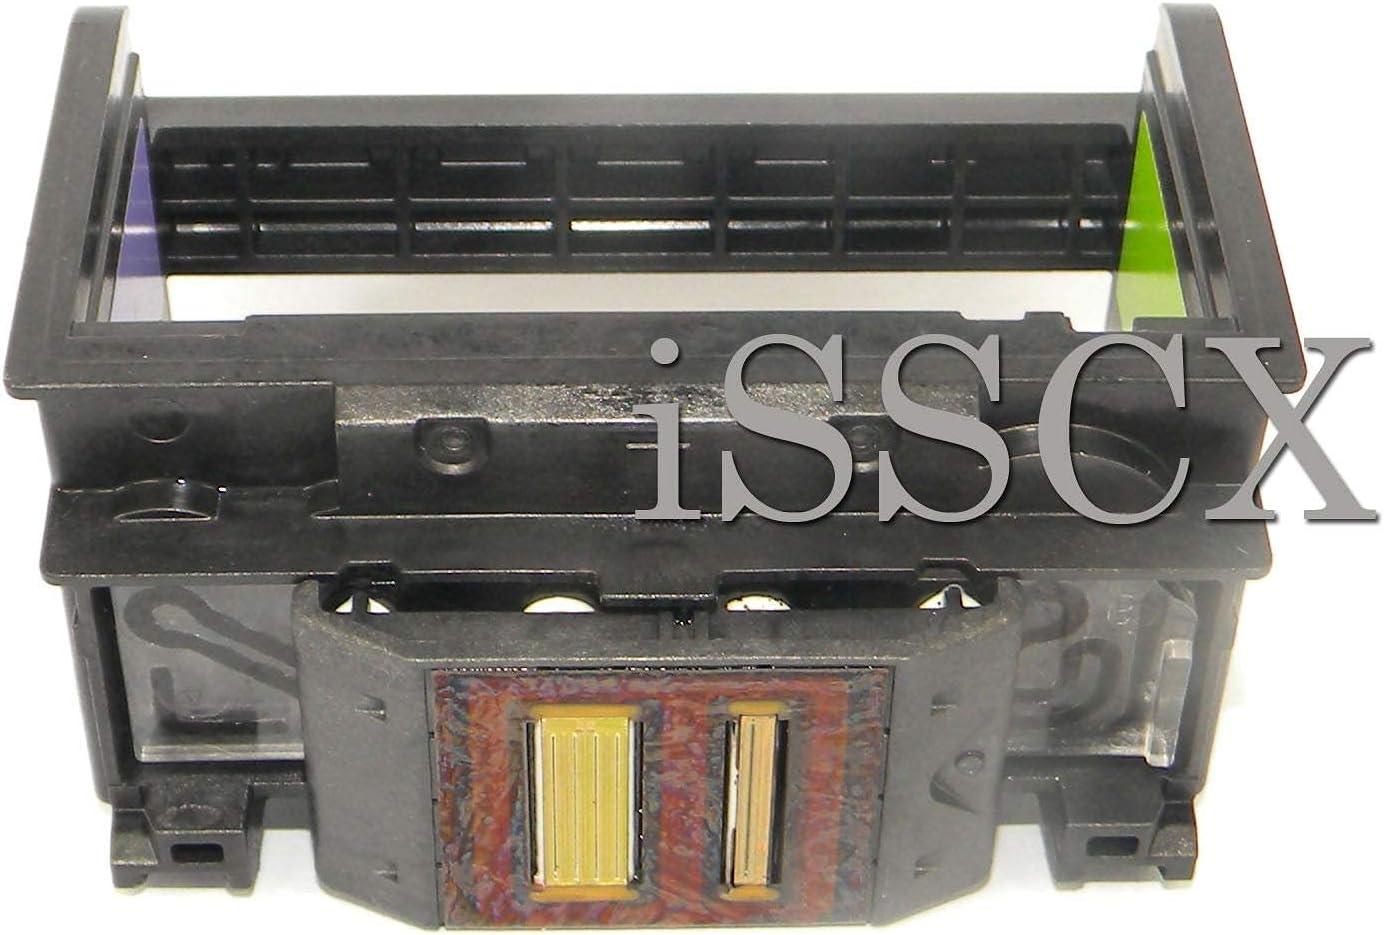 Replacement Parts Accessories for Printer 5Slot Print Head 564 Compatible with HP 7510 7515 D5460 D7560 B8550 C5370 C5380 C6300 C6380